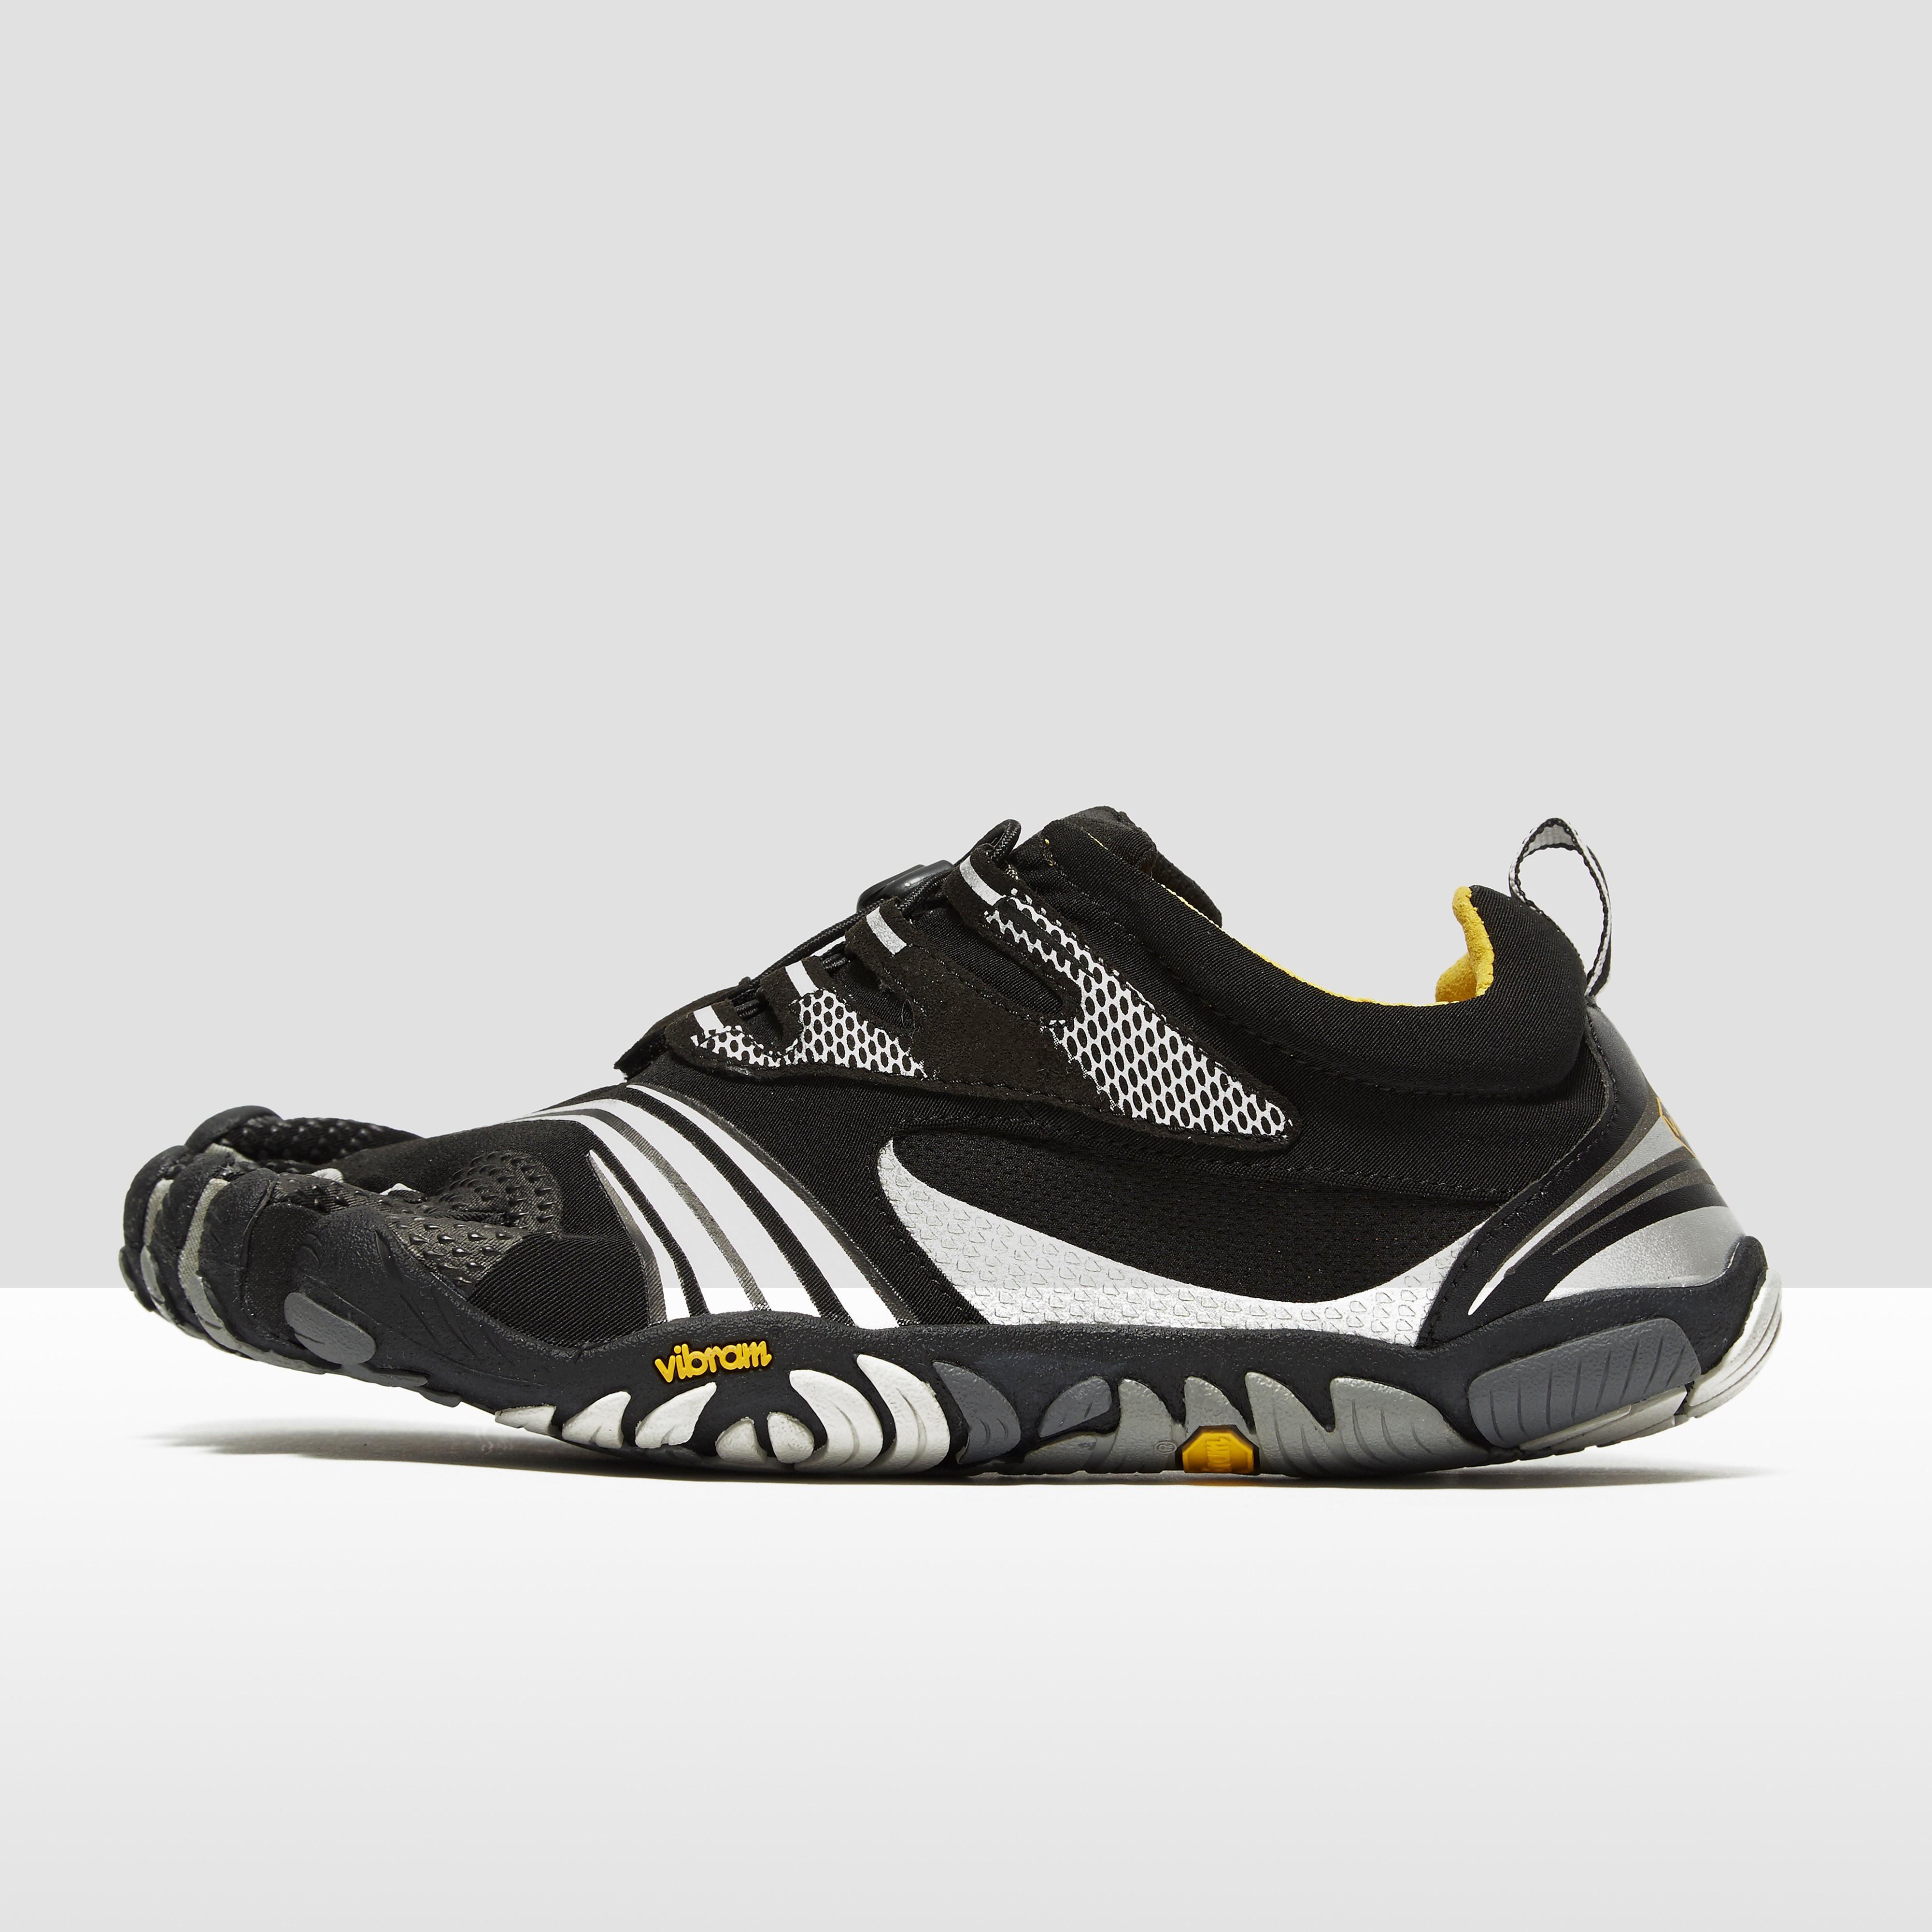 Vibram Five Fingers KMD Sport LS Men's Running Shoe